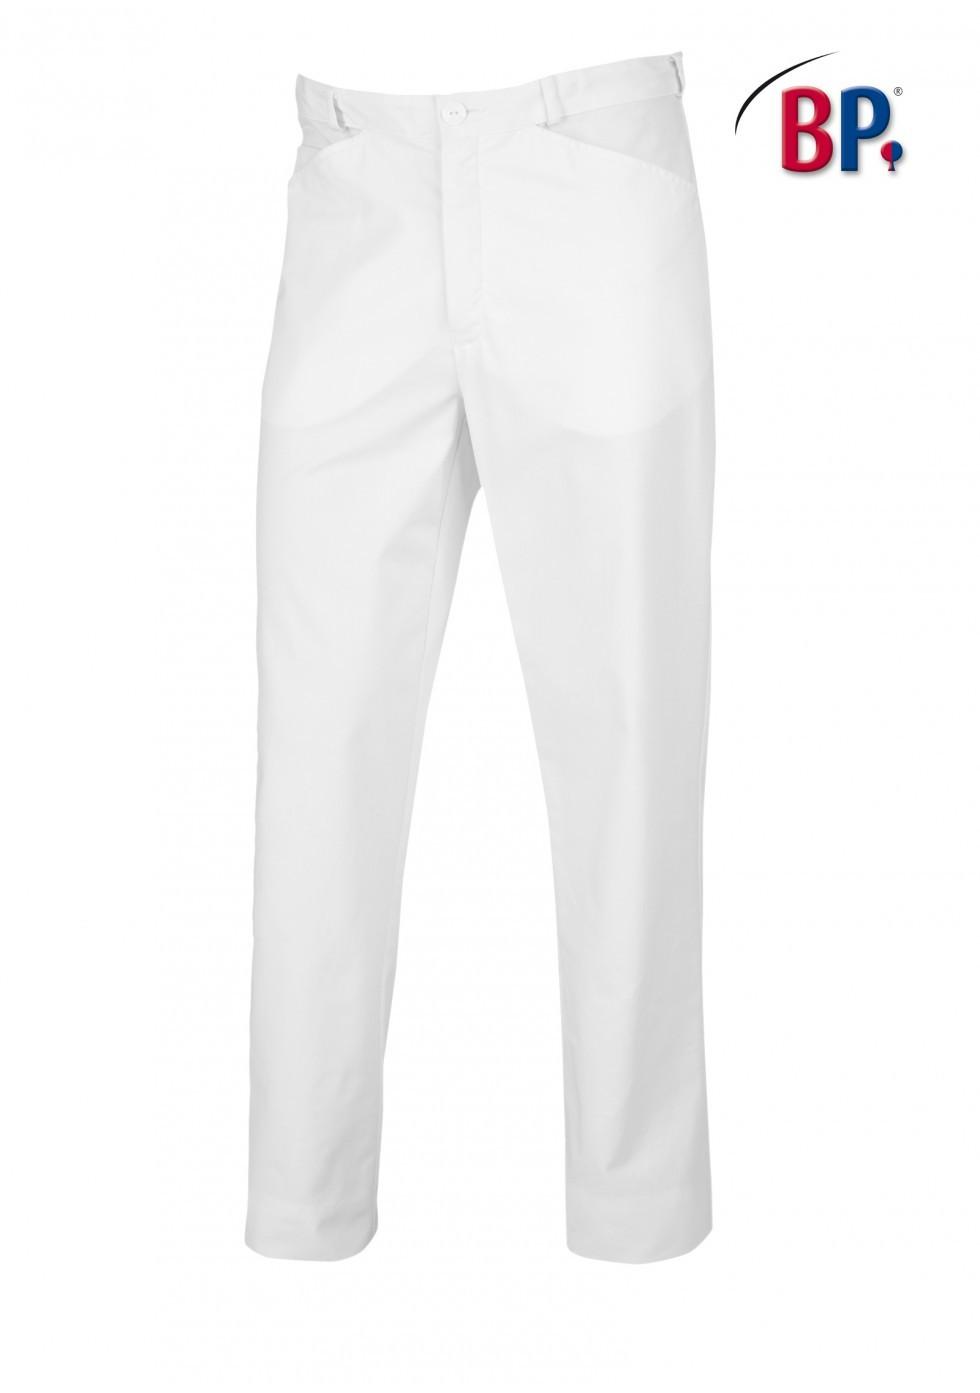 BP Praxishose 1491 130 21 Weiß